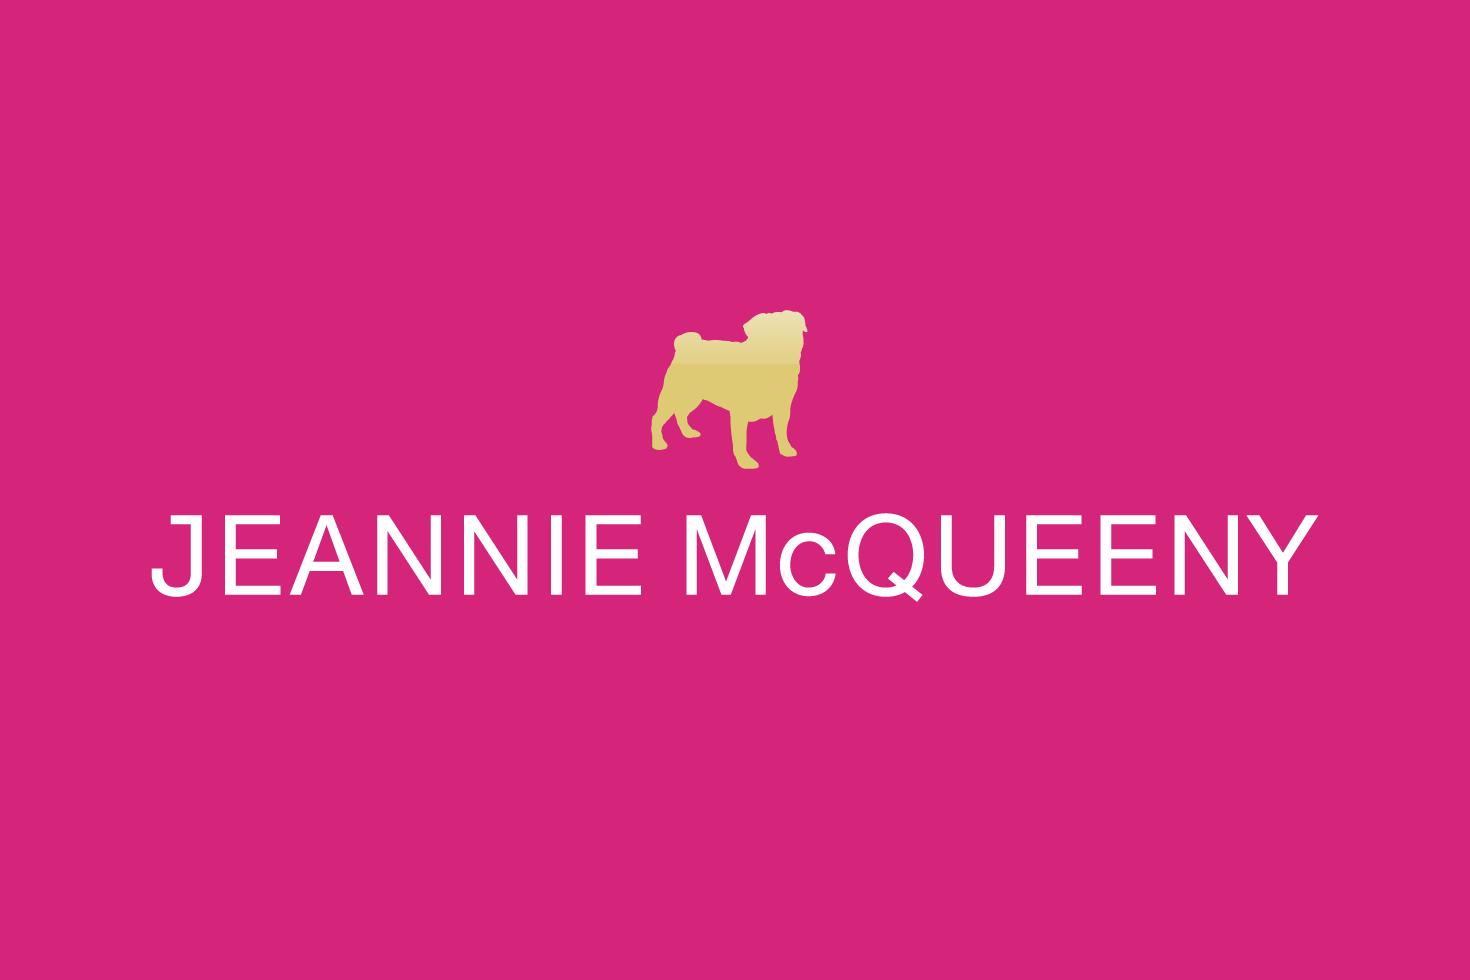 Jeannie McQueeny logo